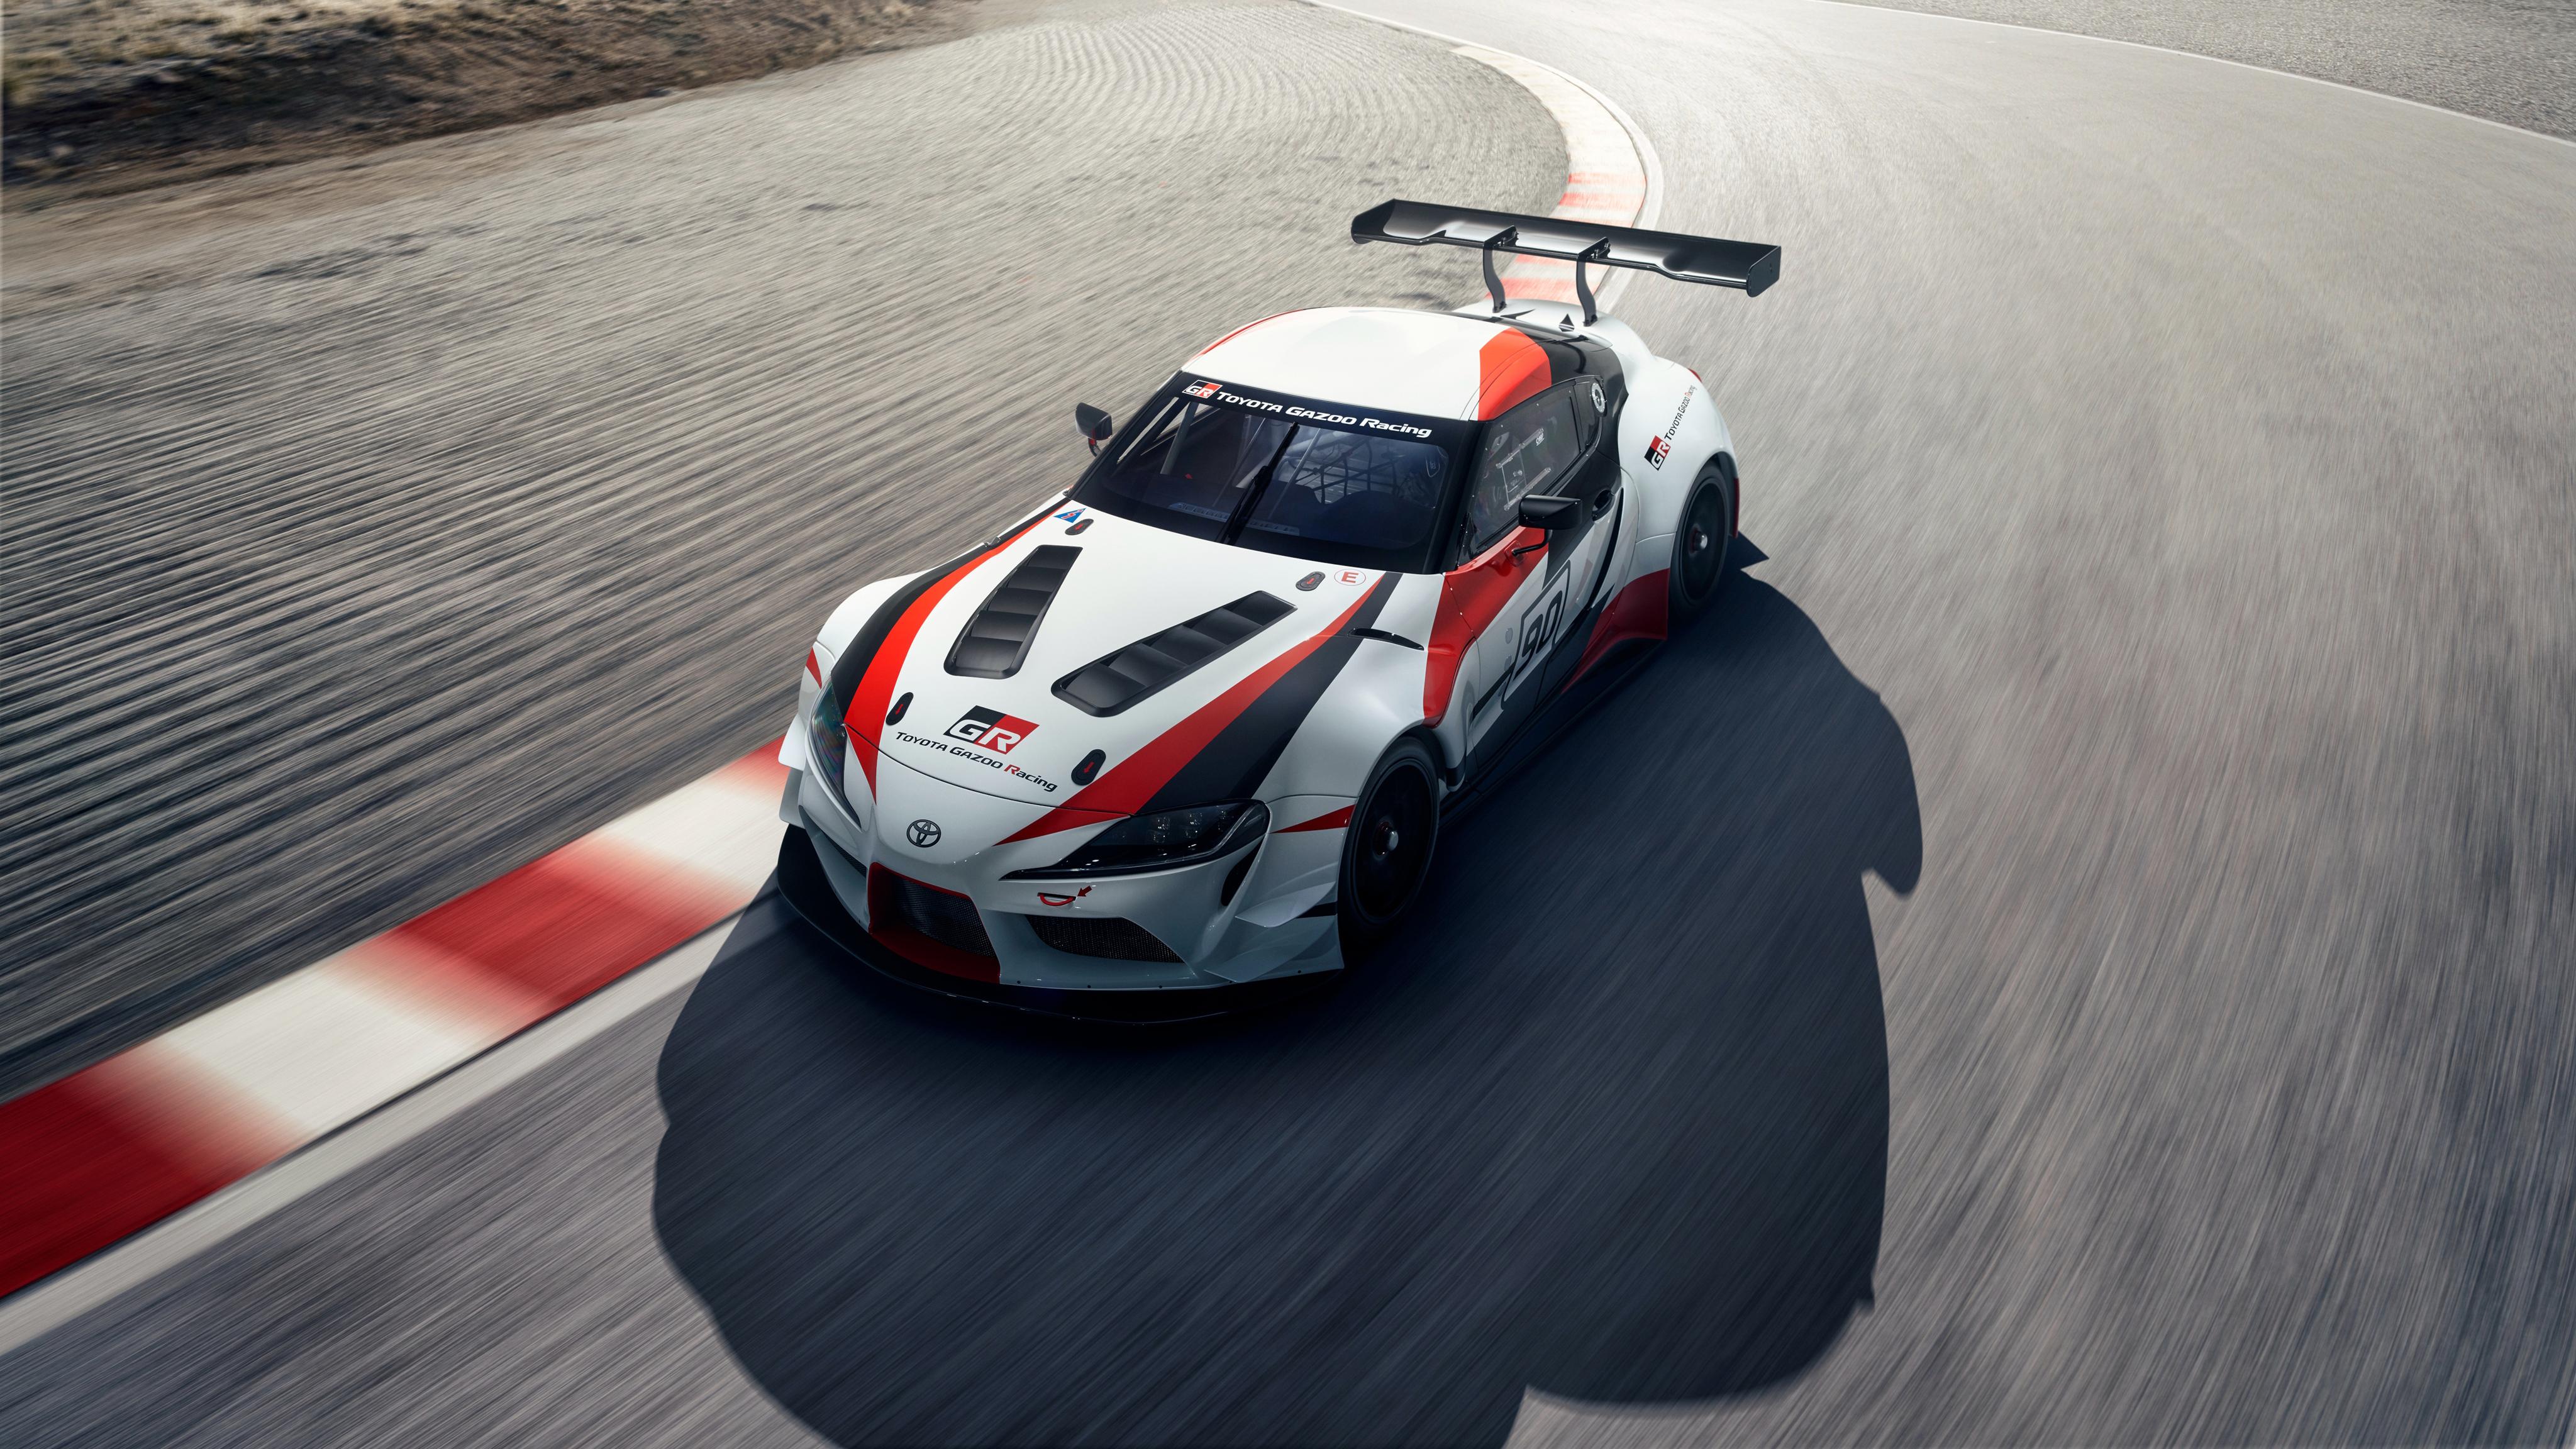 Iphone X Verge Wallpaper 2018 Toyota Gr Supra Racing Concept 4k 4 Wallpaper Hd